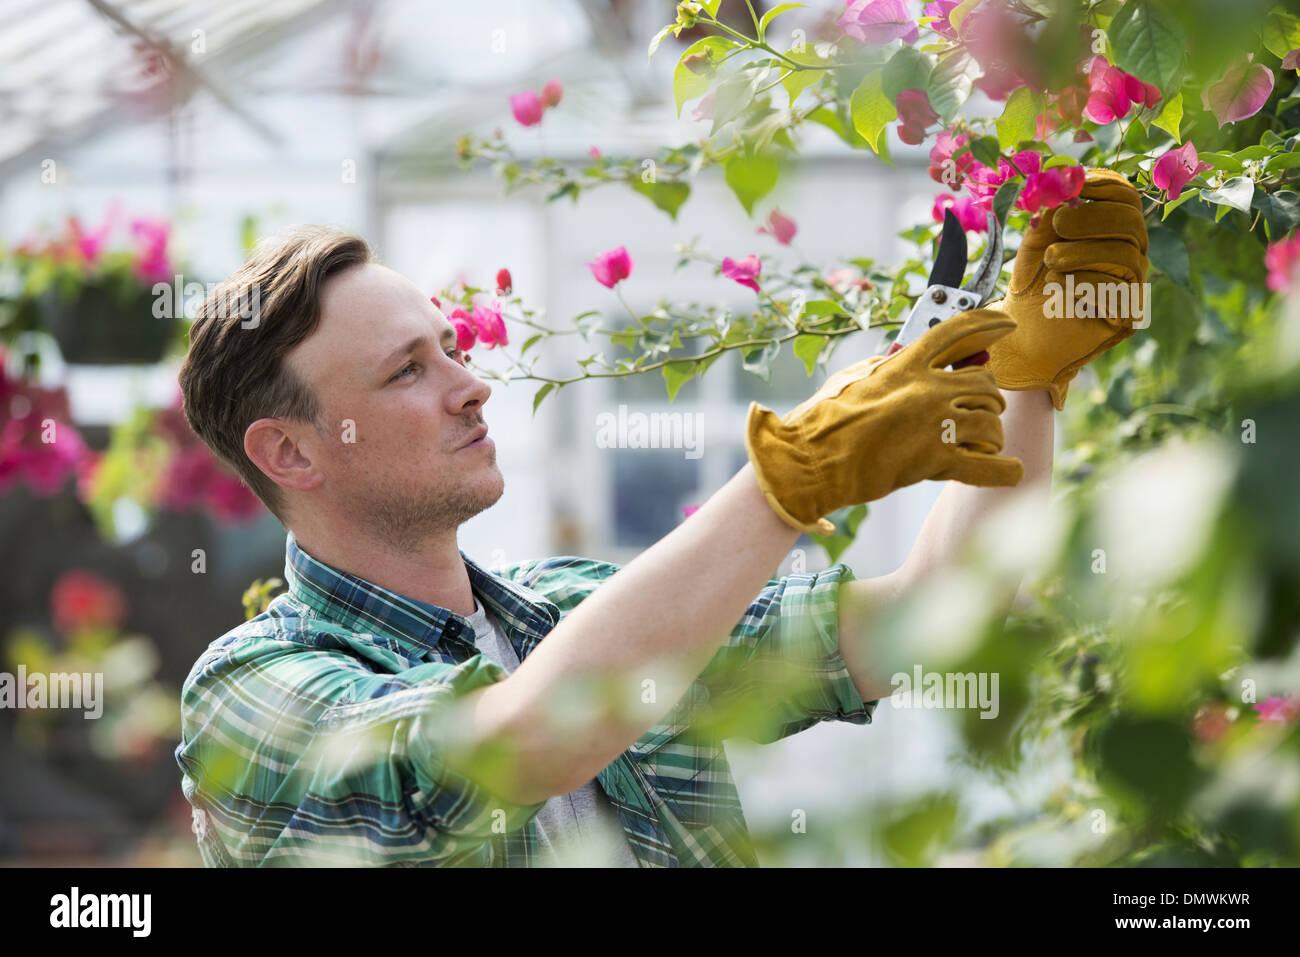 A man working in an organic nursery greenhouse. - Stock Image